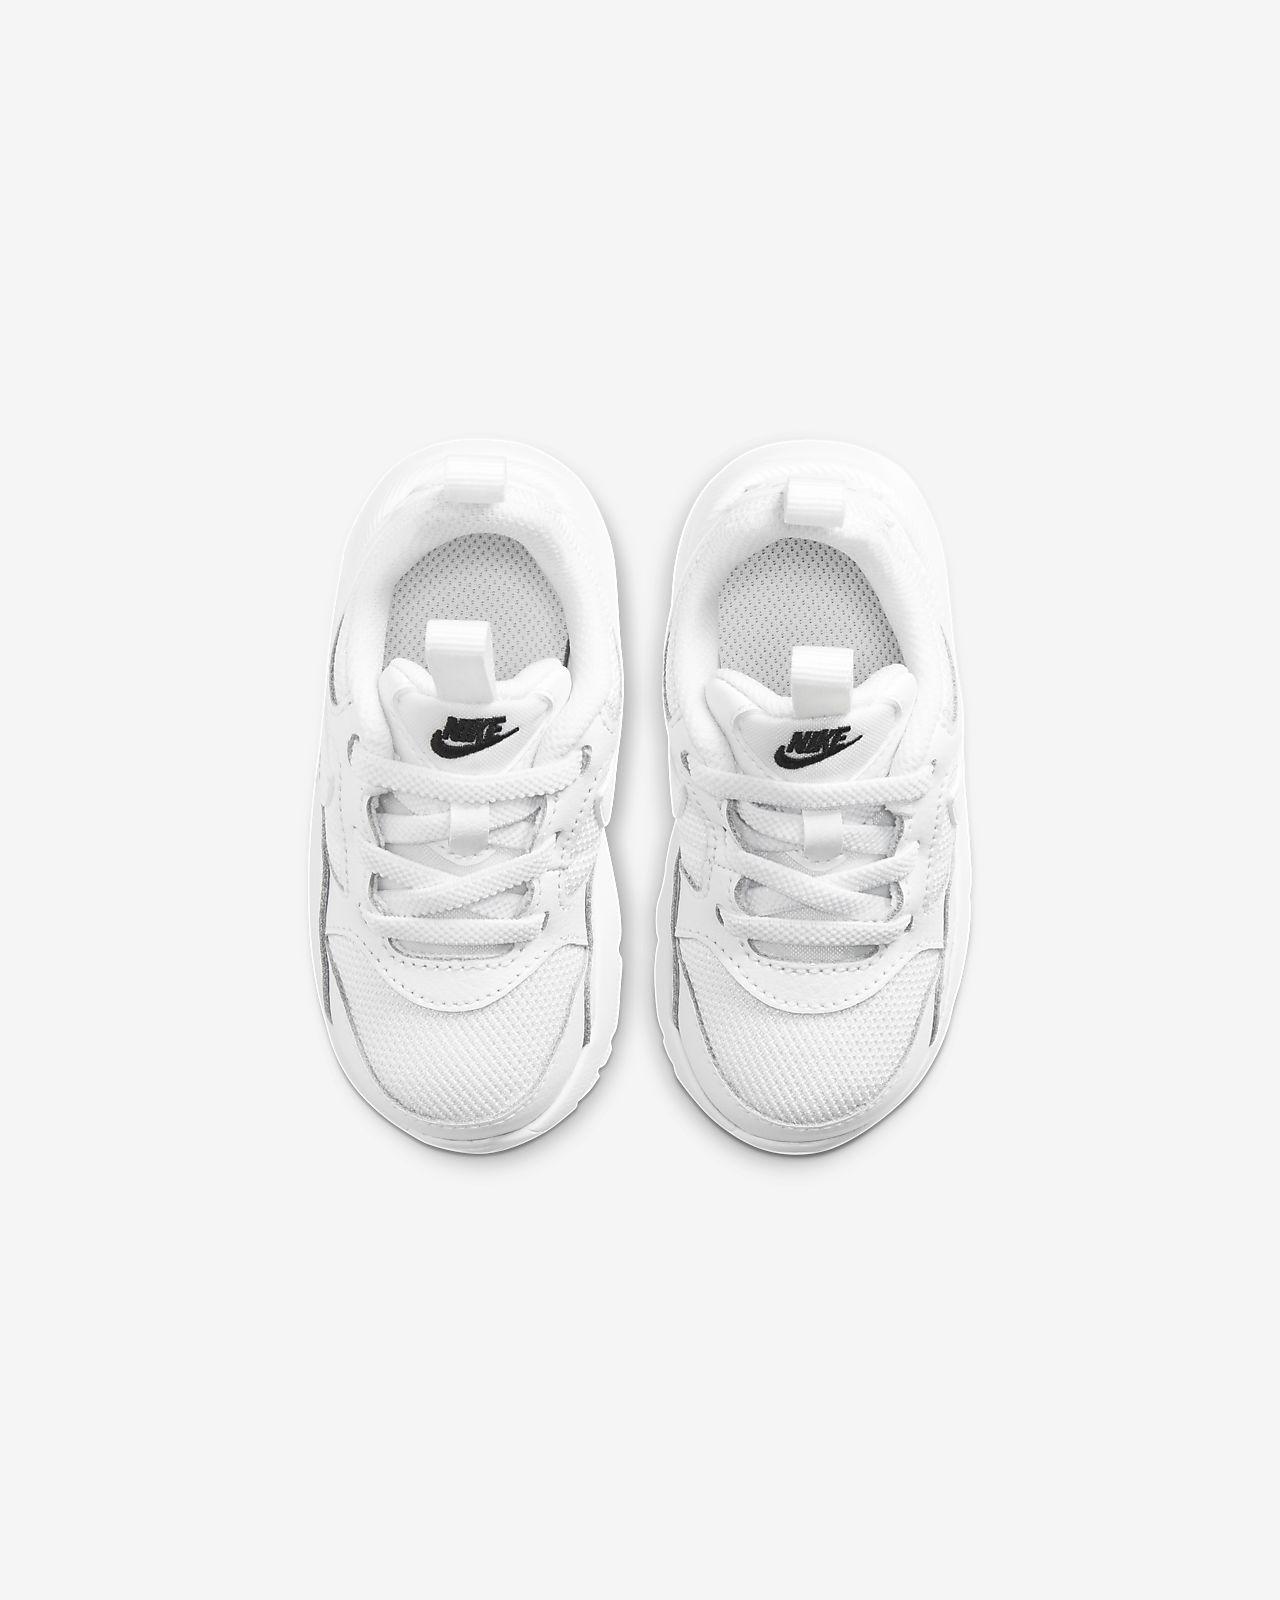 Novo Nike Feminino Air Max 270 Tênis BrancoPretobranco